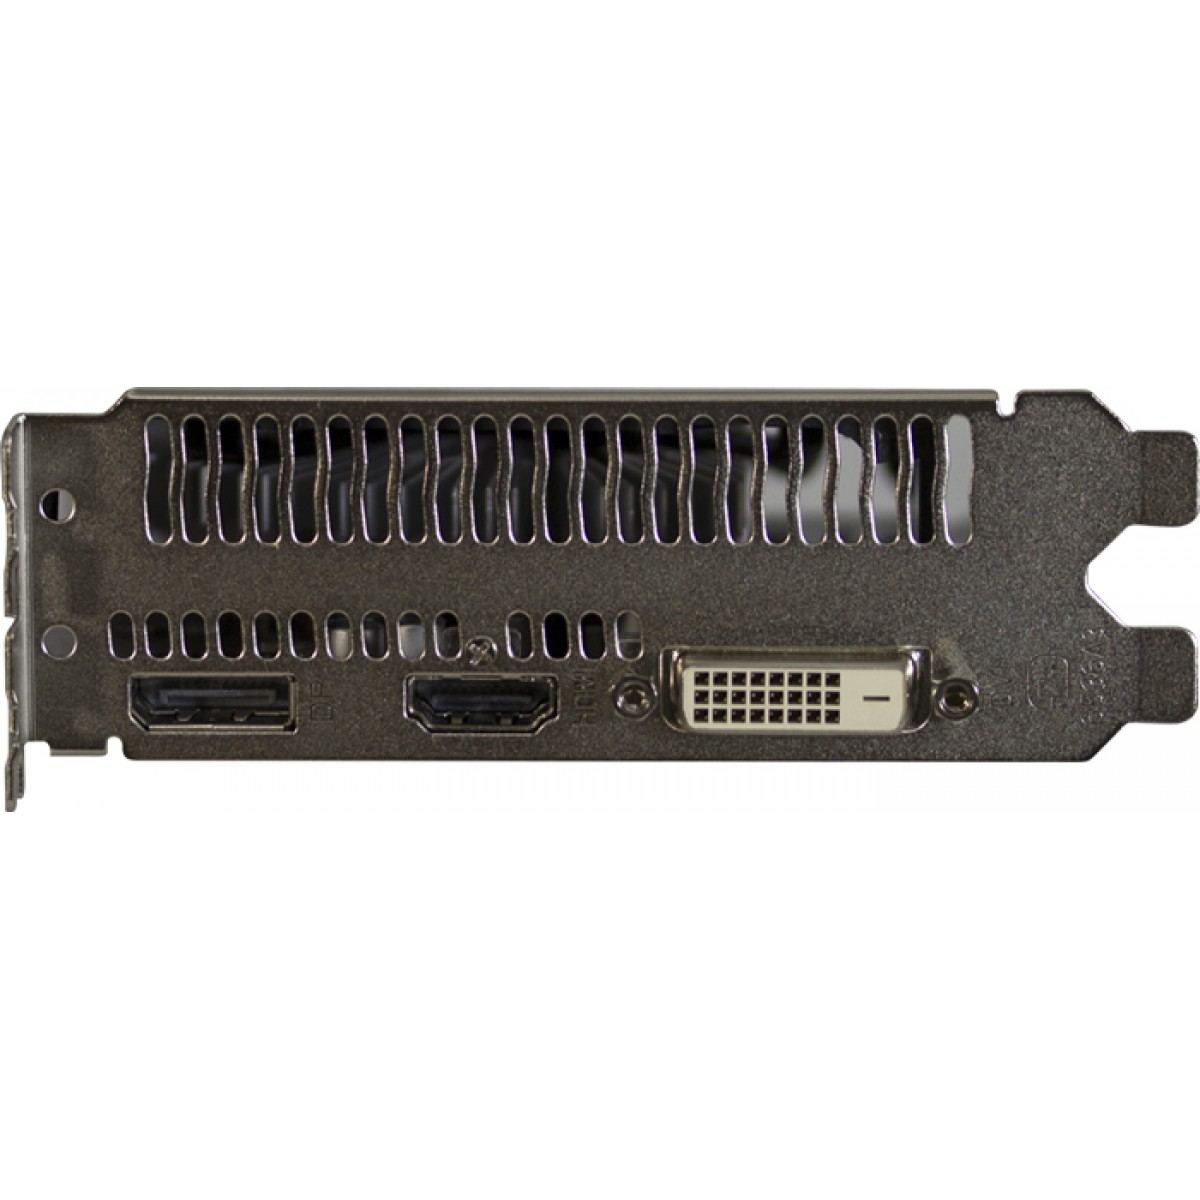 Placa de Vídeo PowerColor Radeon RX 550, 4GB GDDR5, 128Bit, AXRX 550 4GBD5-DHA/OC